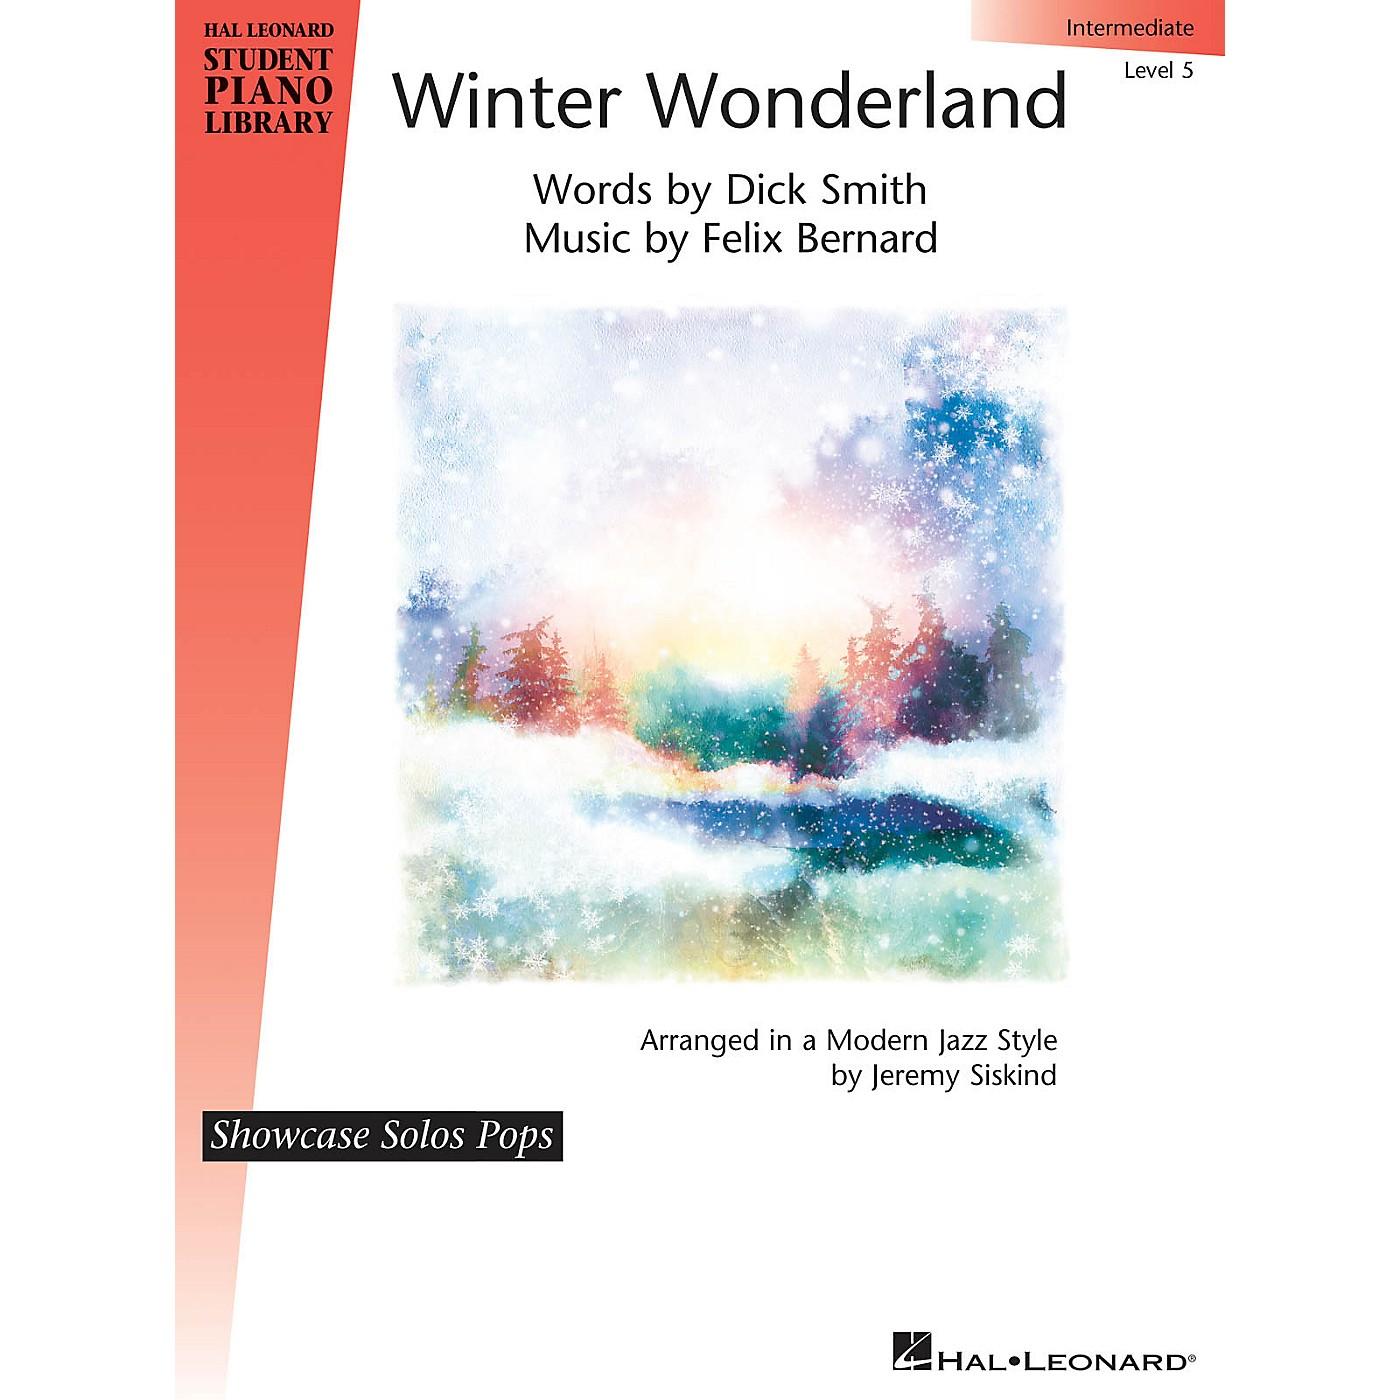 Hal Leonard Winter Wonderland Hal Leonard Student Piano Library Showcase Solos Pops level 5 Intermediate by Felix Bernard thumbnail